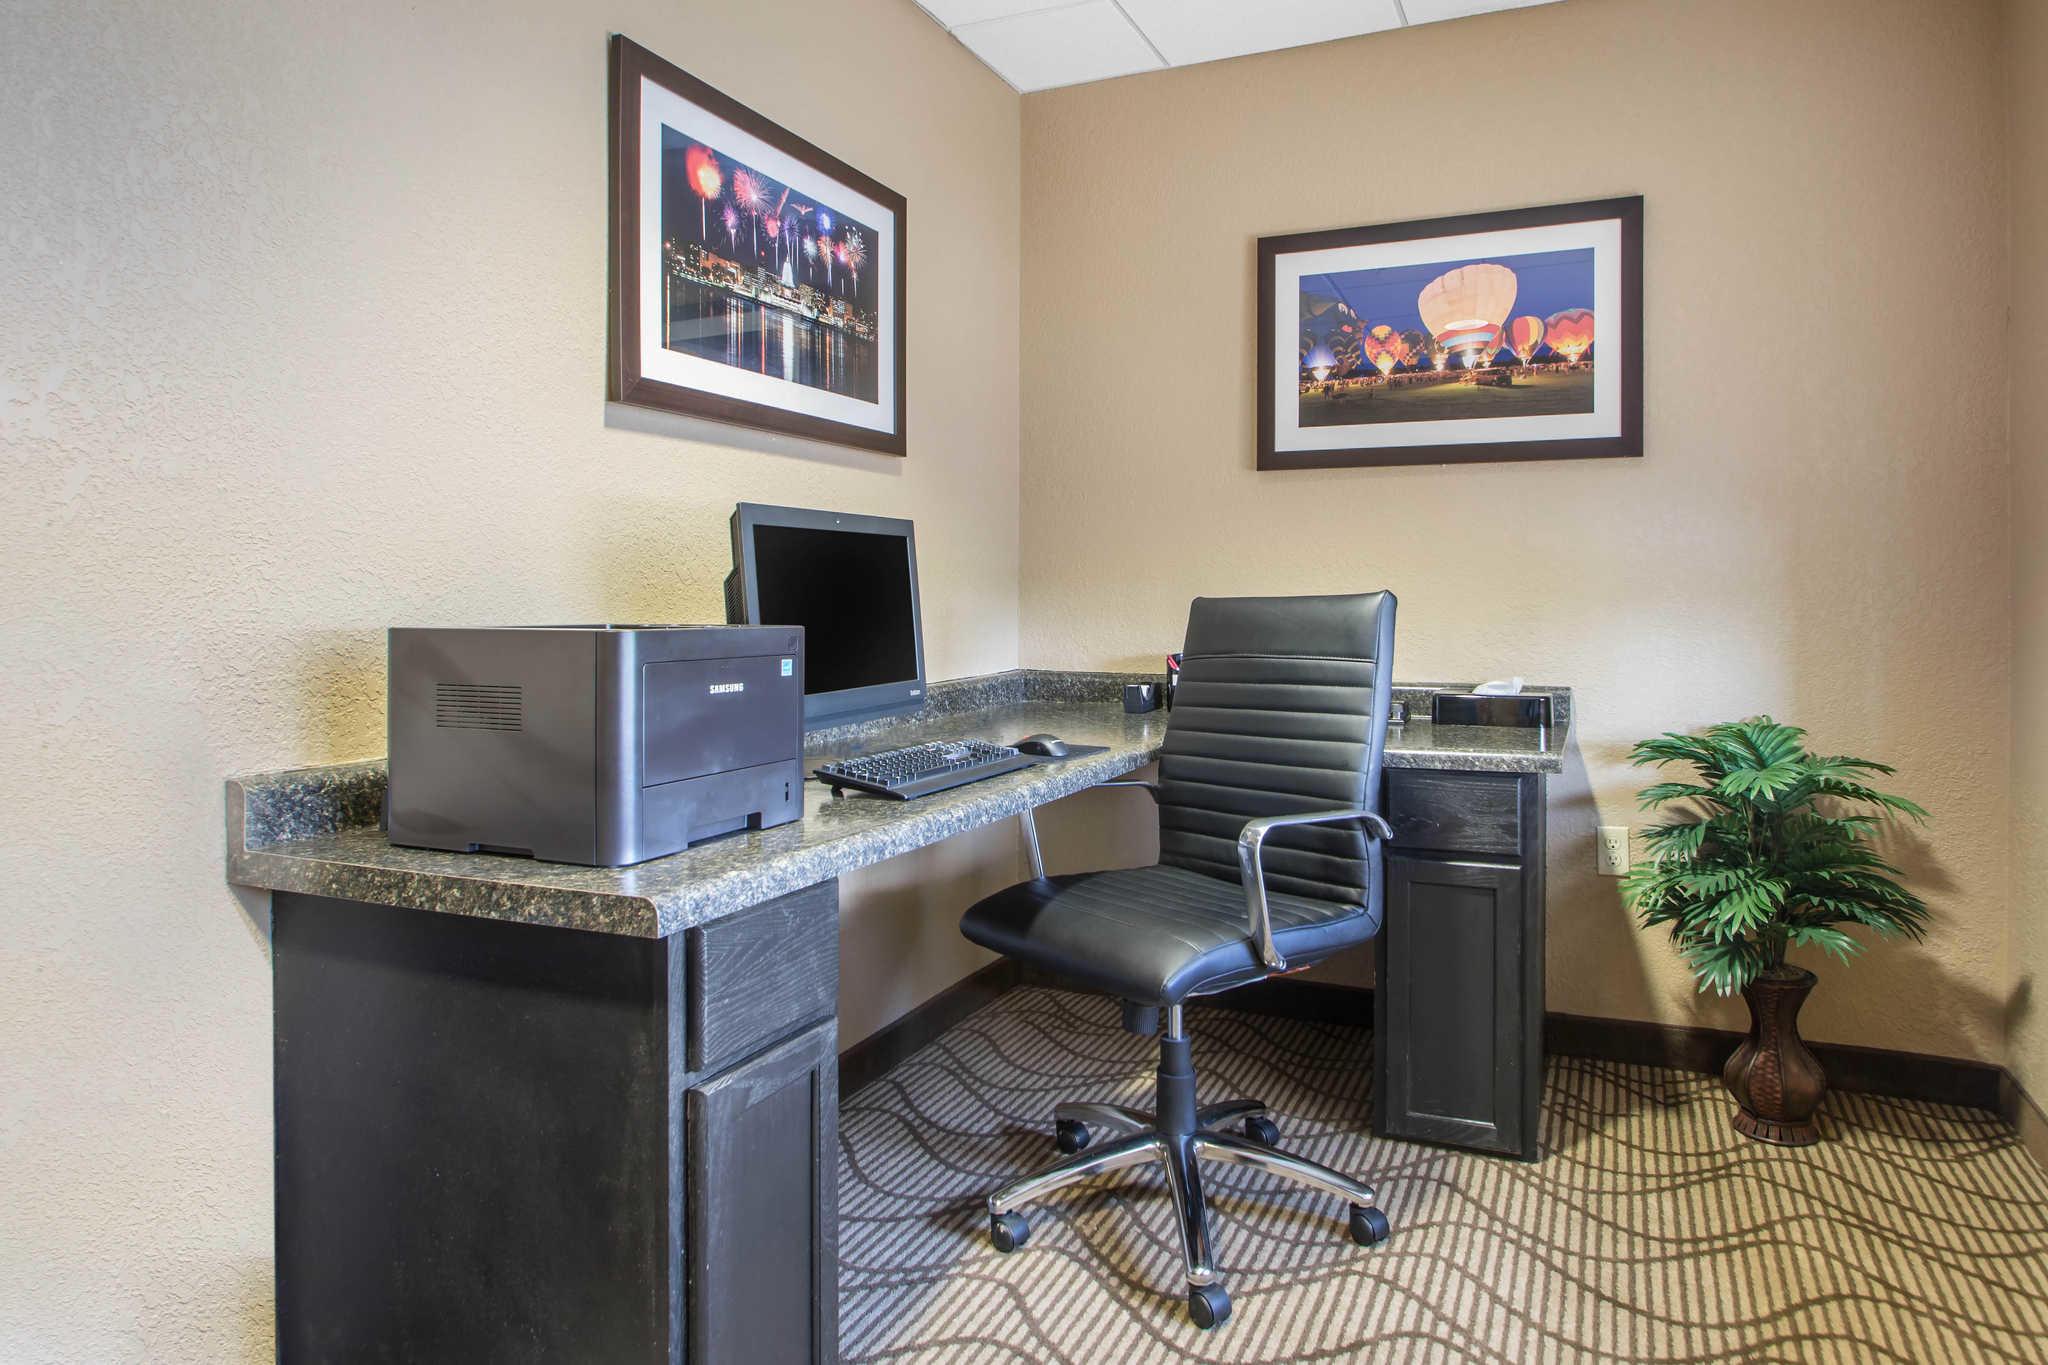 Comfort Suites Johnson Creek Conference Center image 31